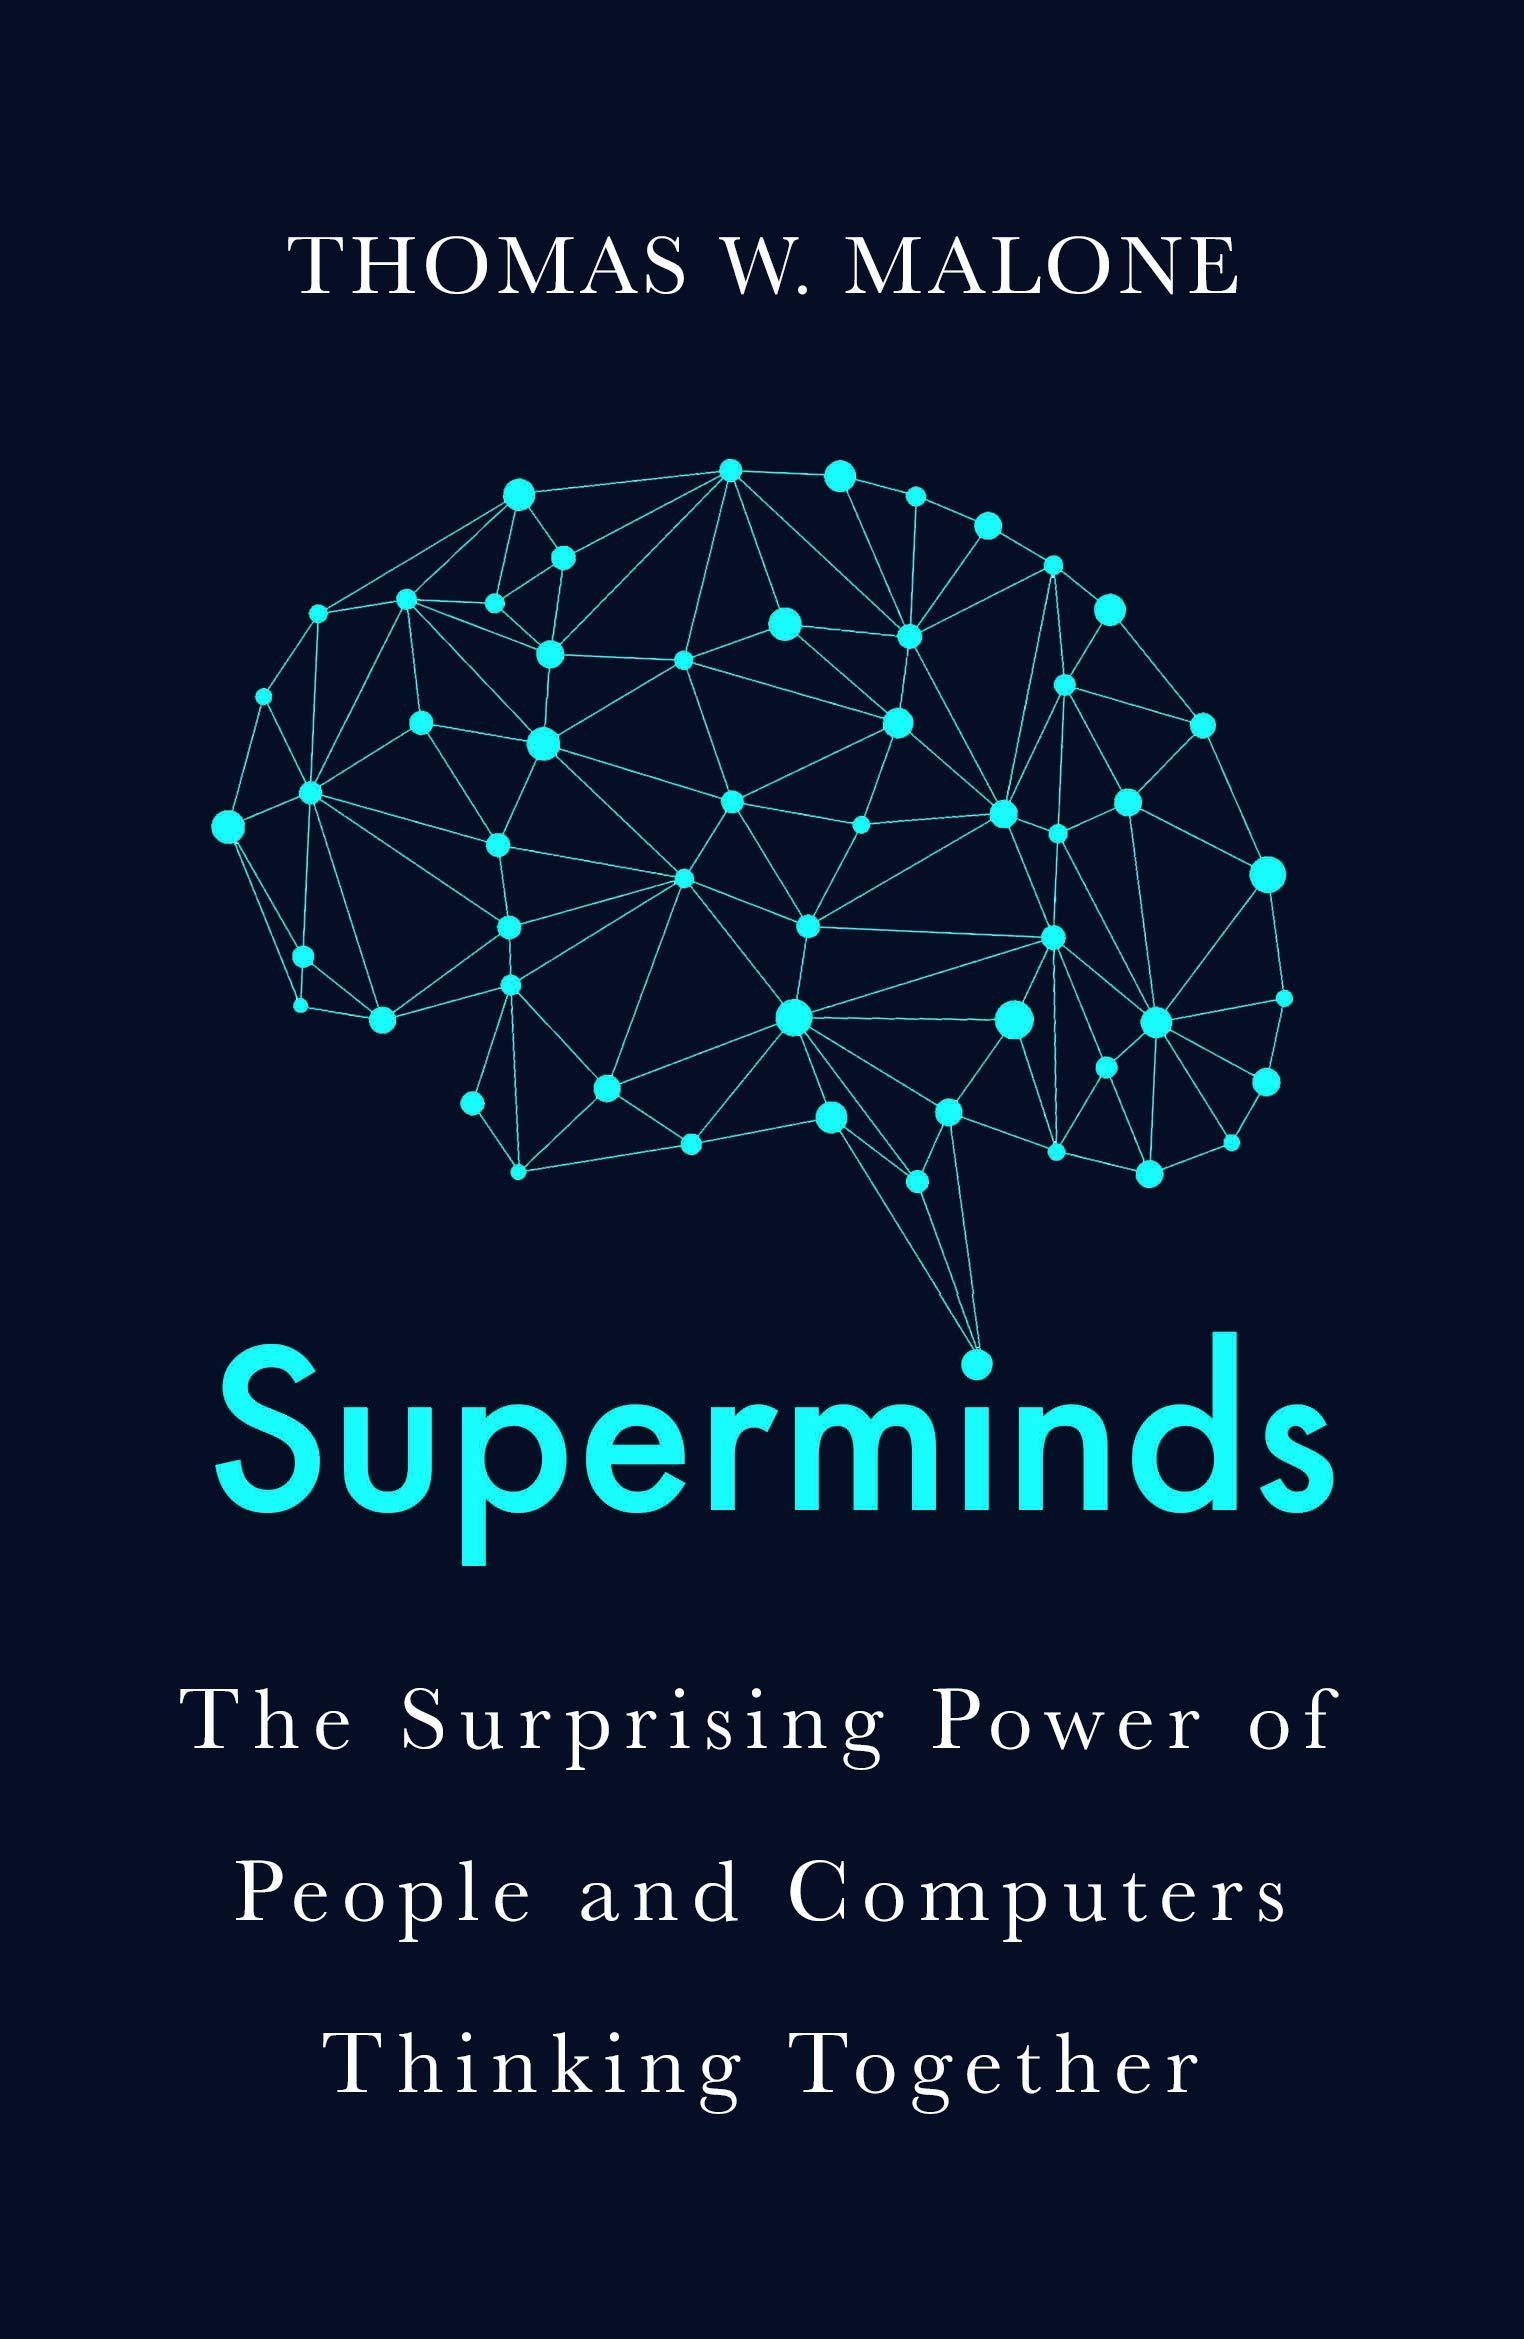 Superminds by Thomas W Malone